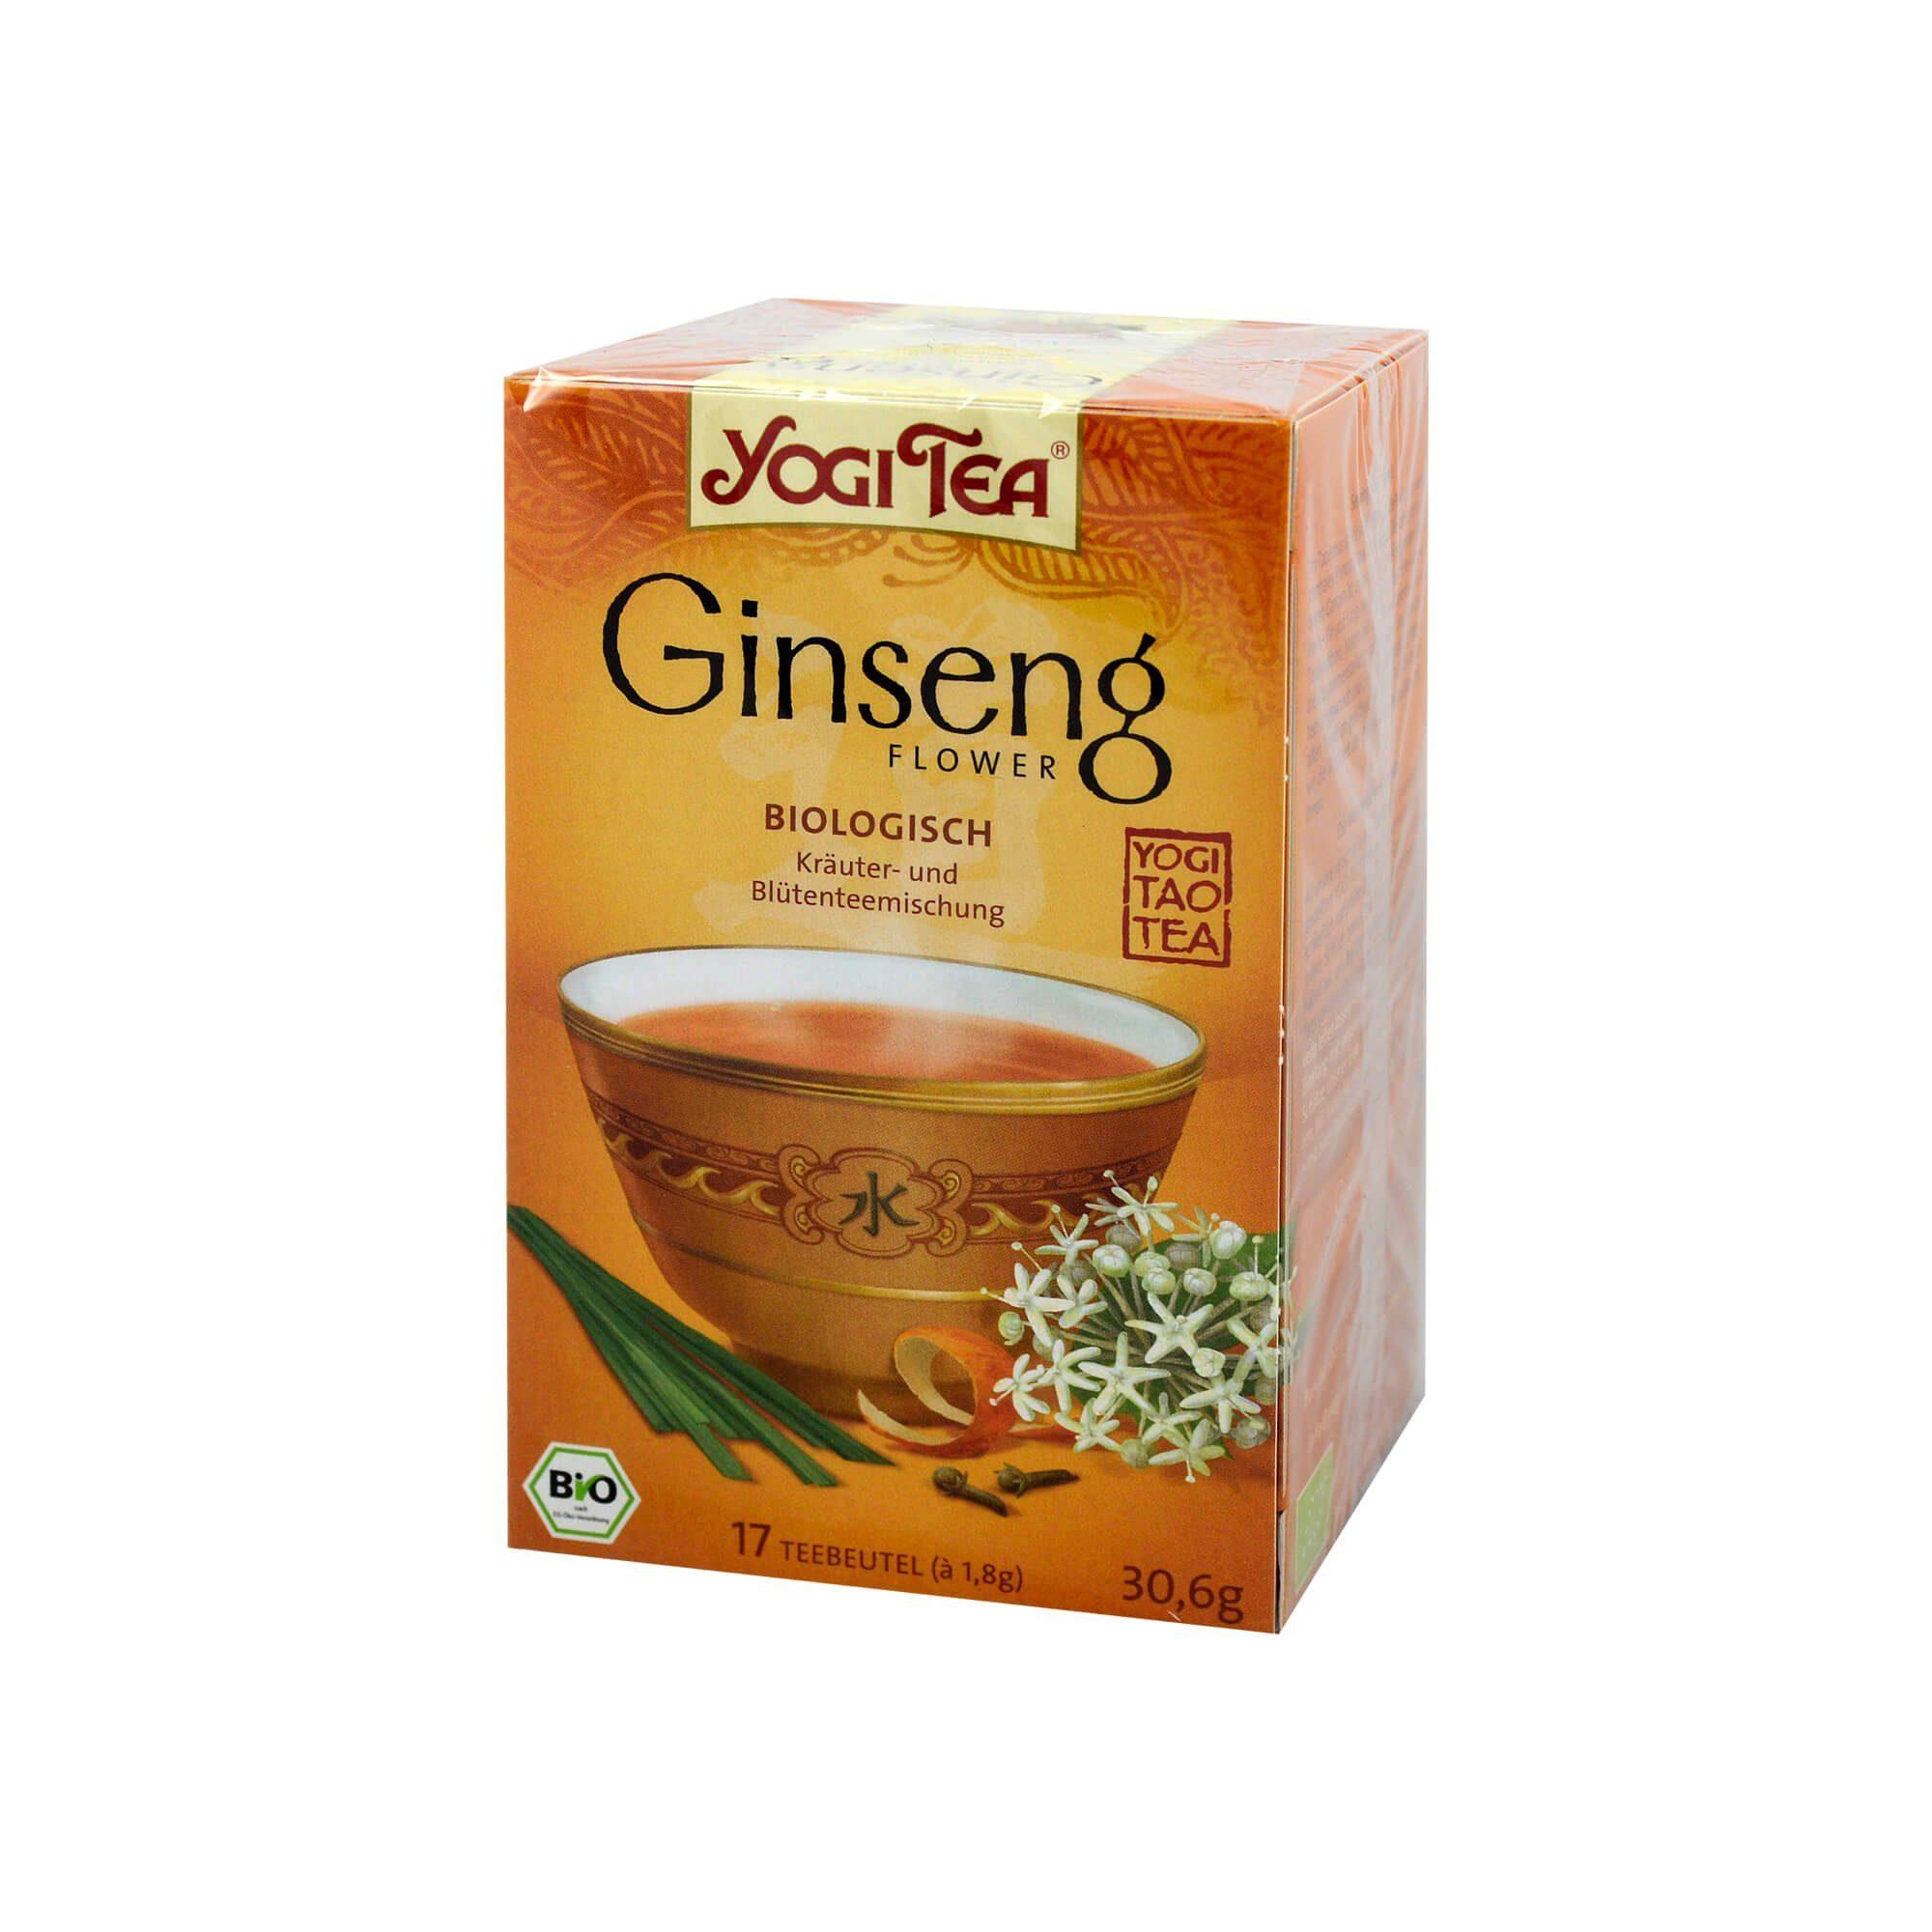 Yogi TEA Ginseng Bio, 17X1.8 g